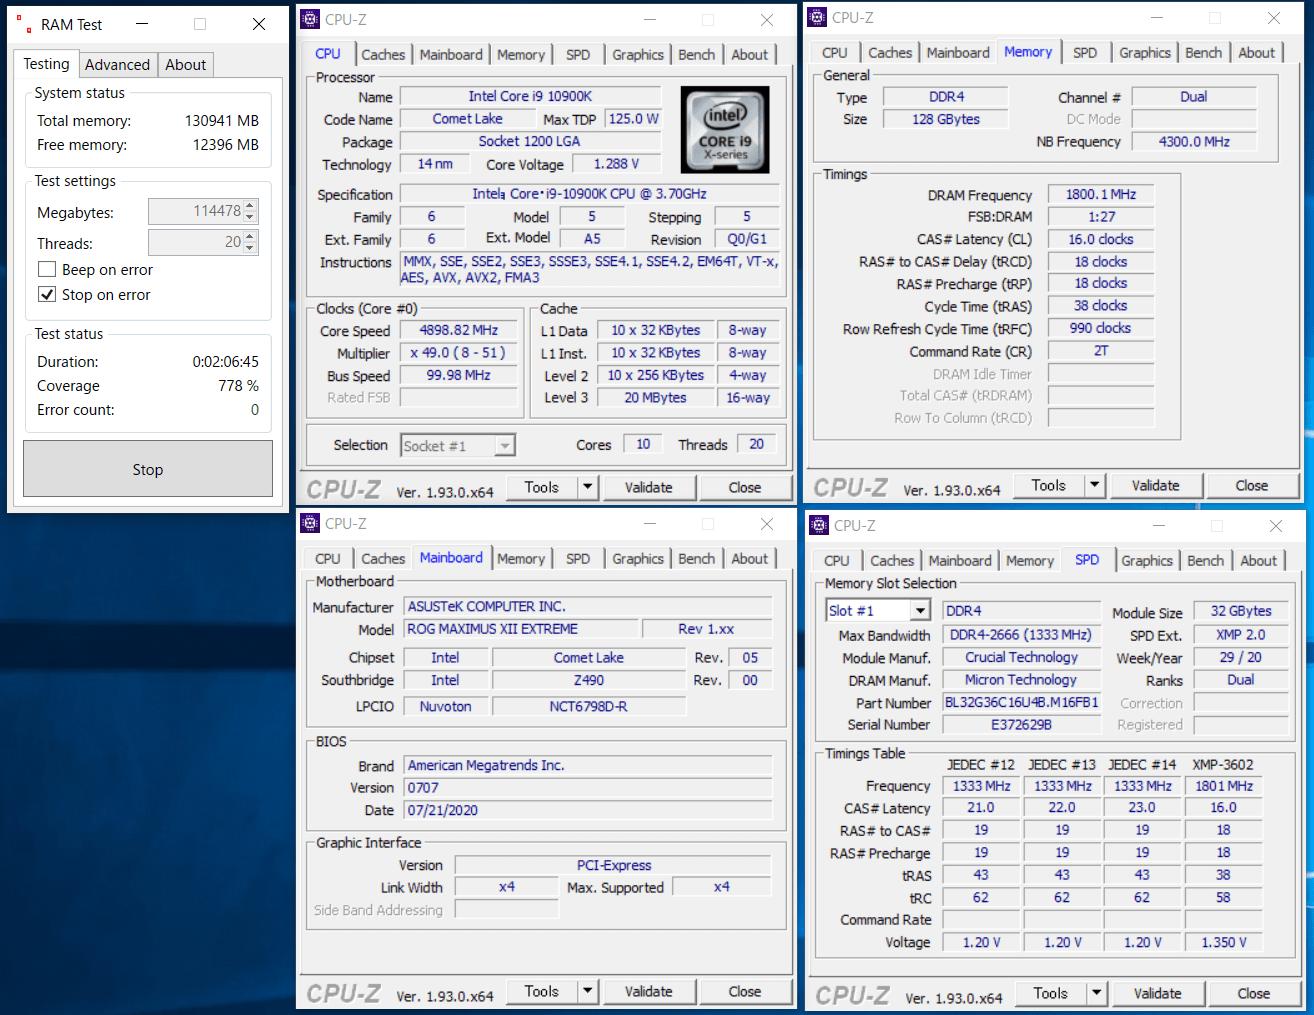 Crucial Ballistix BL2K32G36C16U4B_Z490_x4_ramtest.png